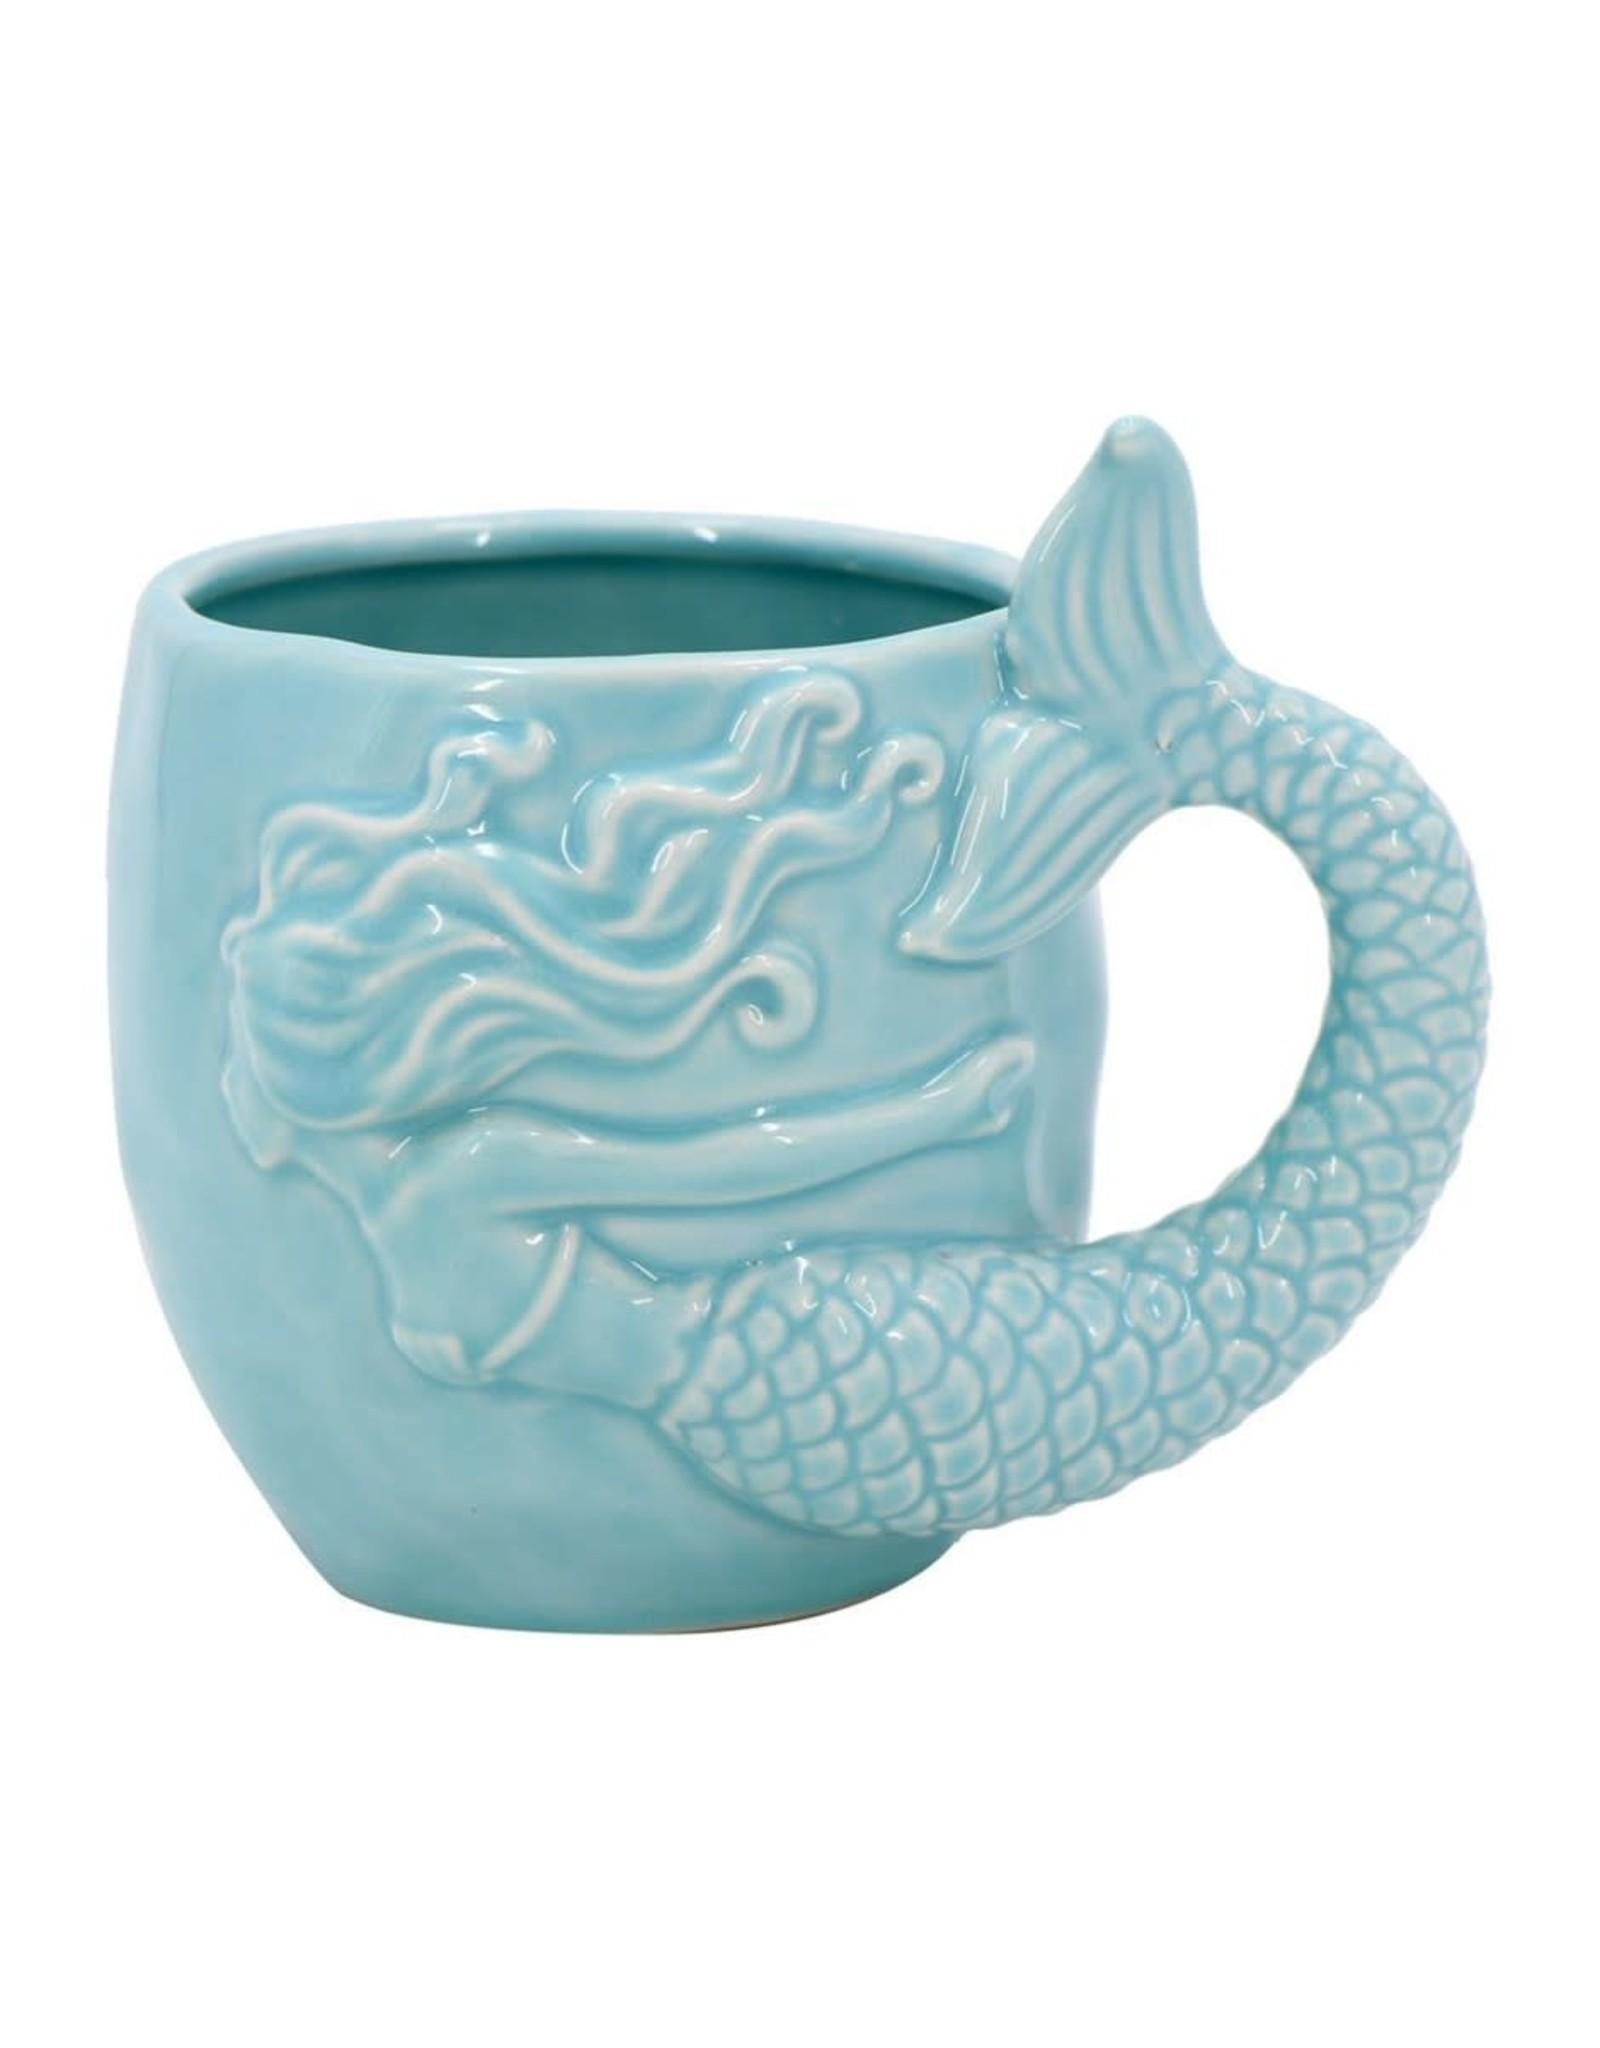 Mermaid Tail Mug 15 oz